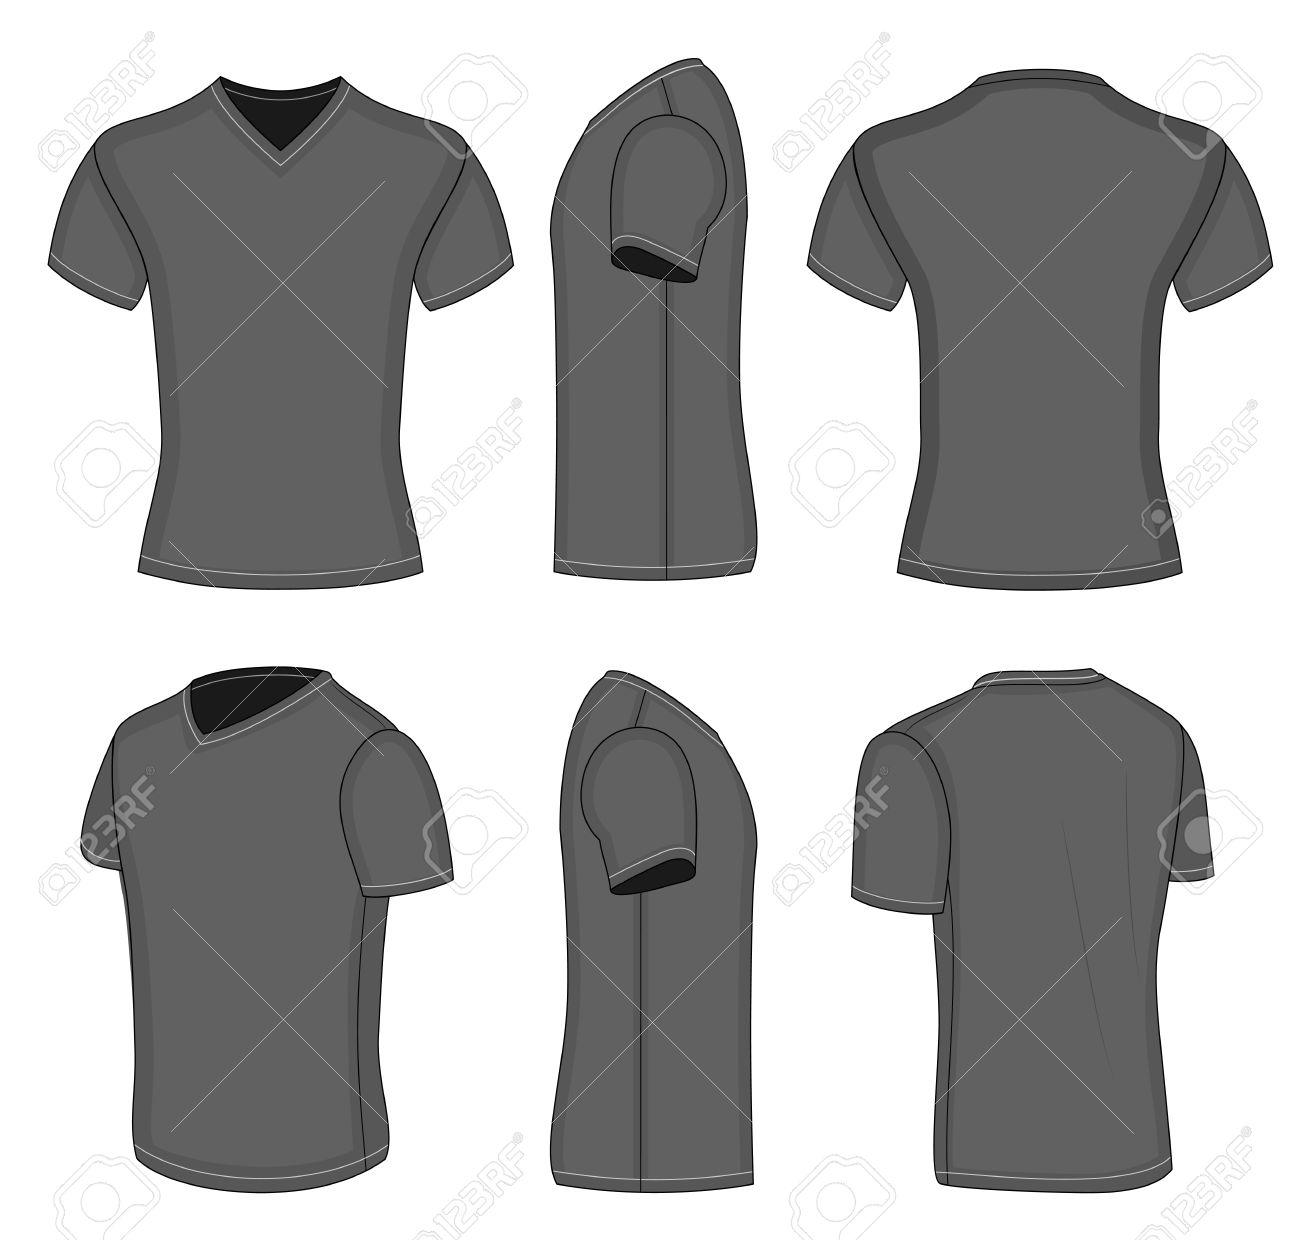 3b7d1b11c All views men's black short sleeve t-shirt v-neck design templates (front